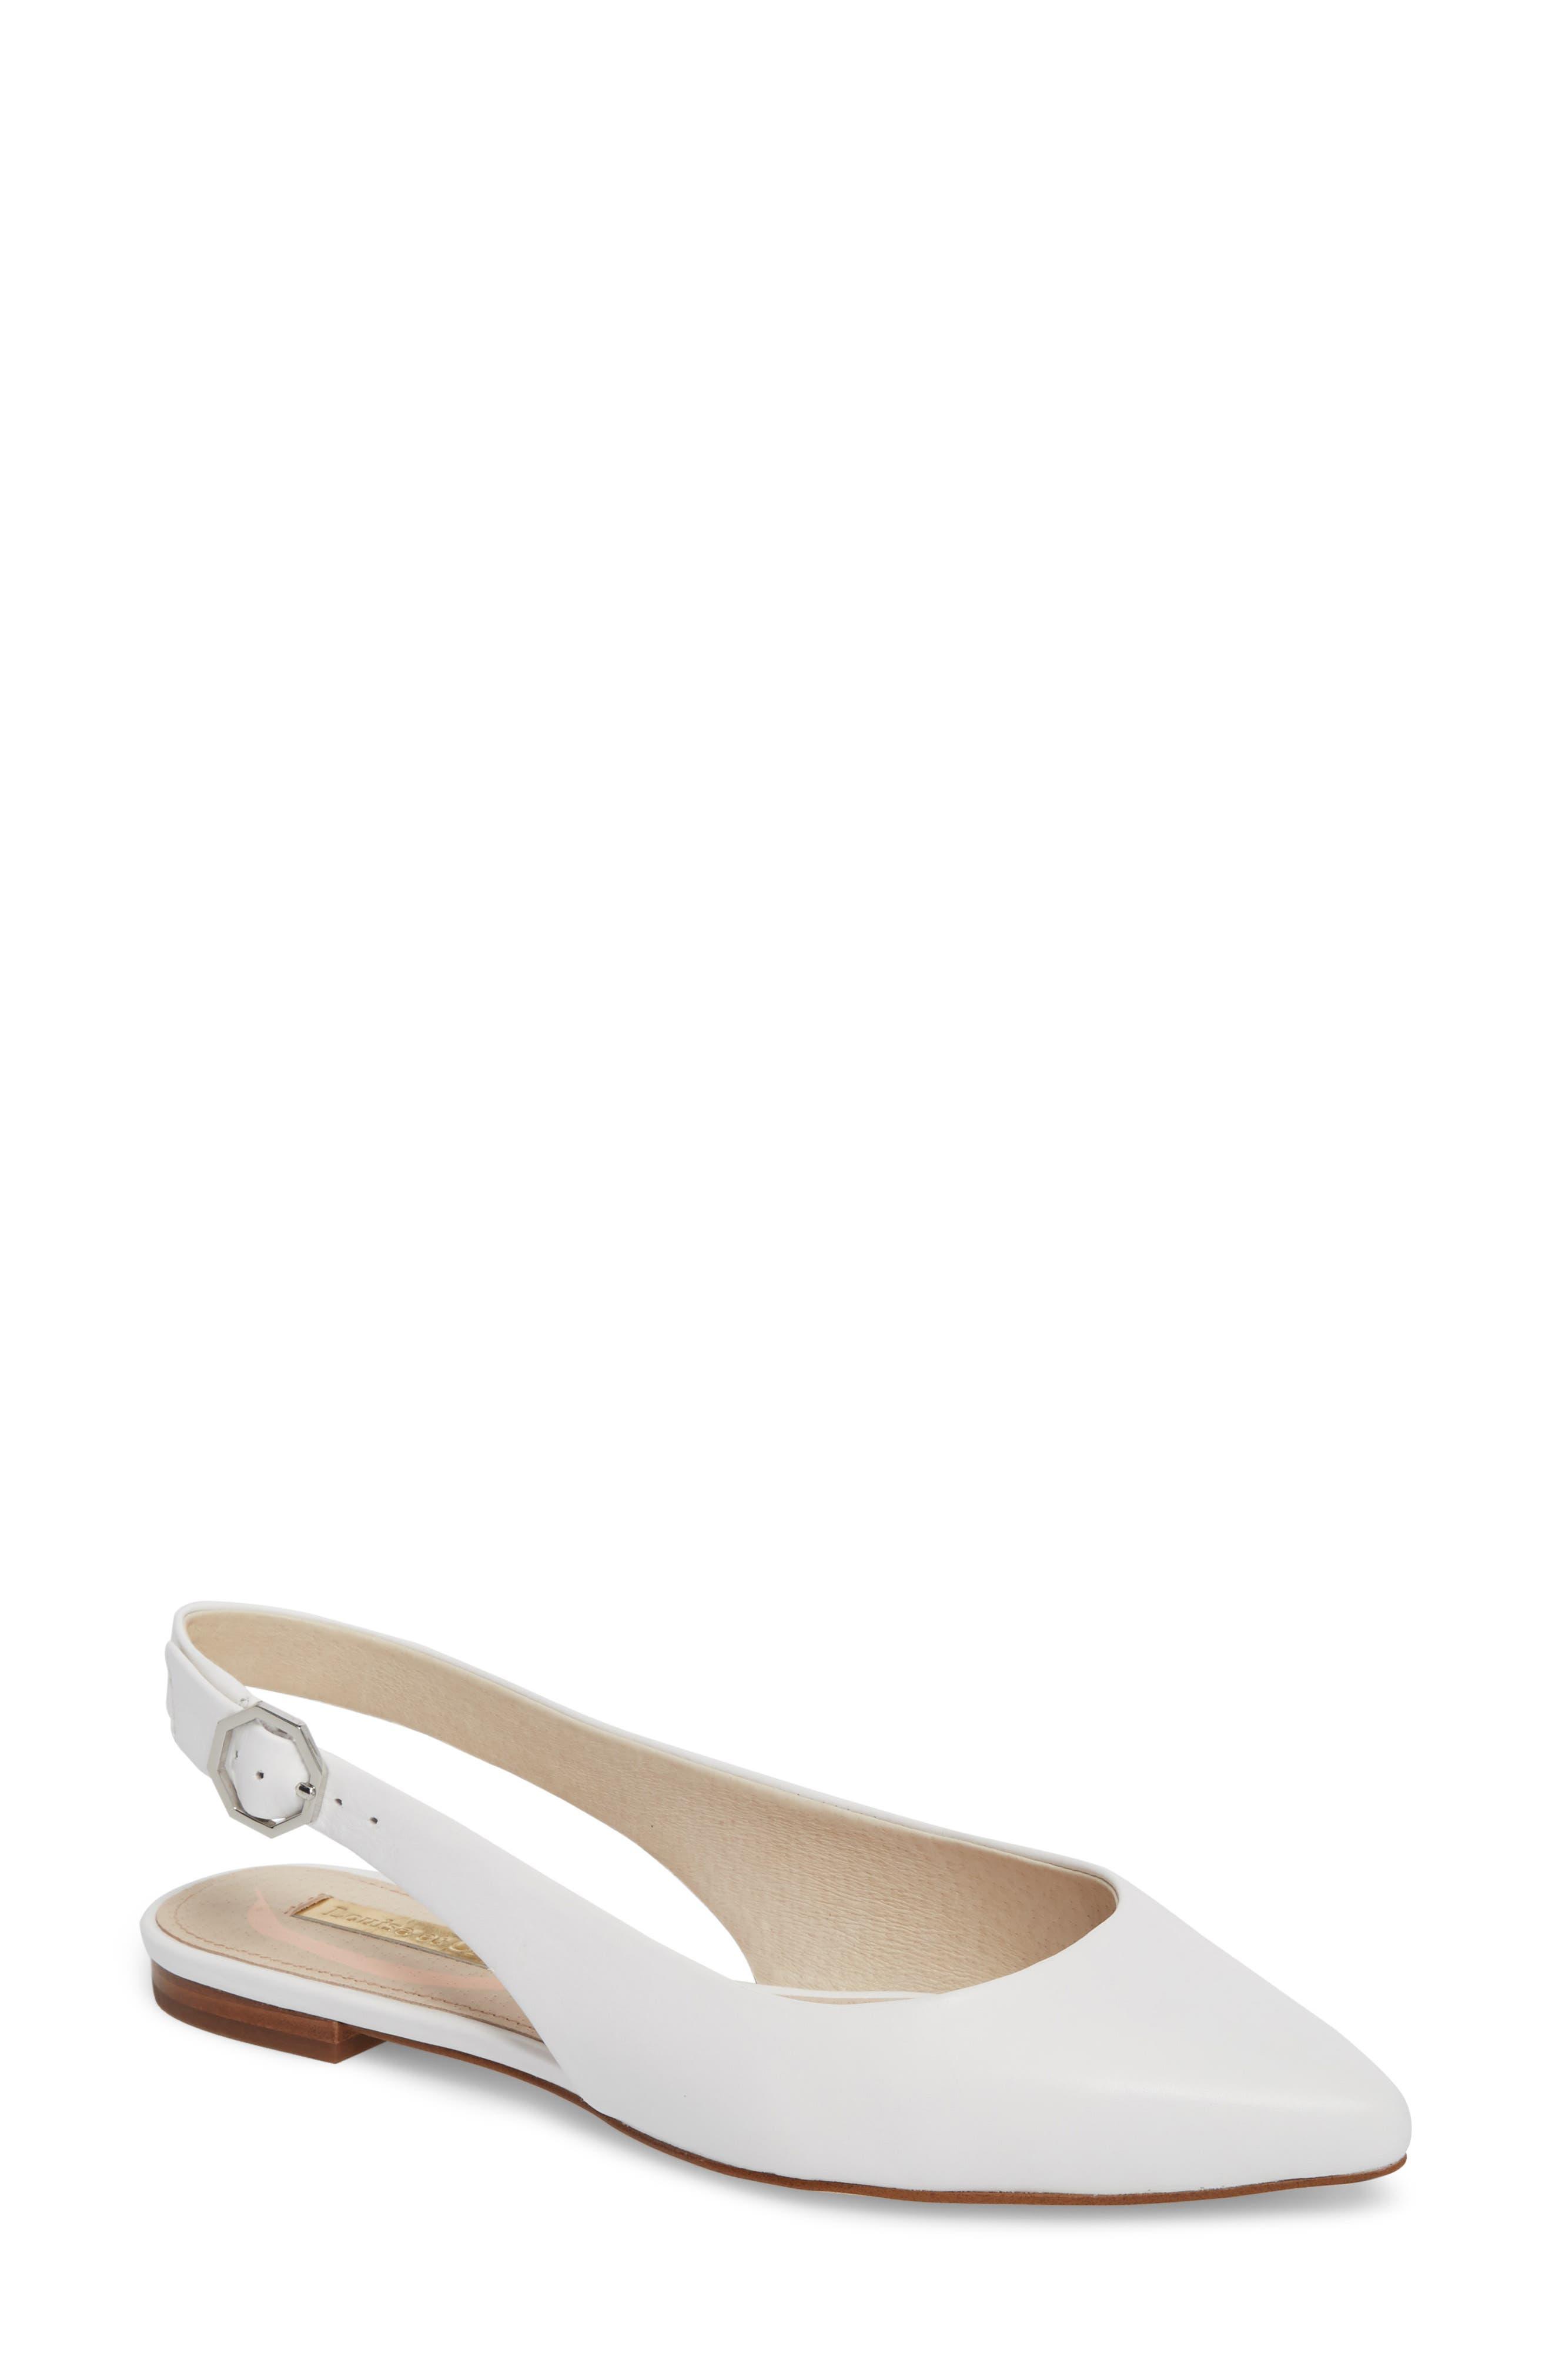 Astrya Slingback Flat,                         Main,                         color, White Leather